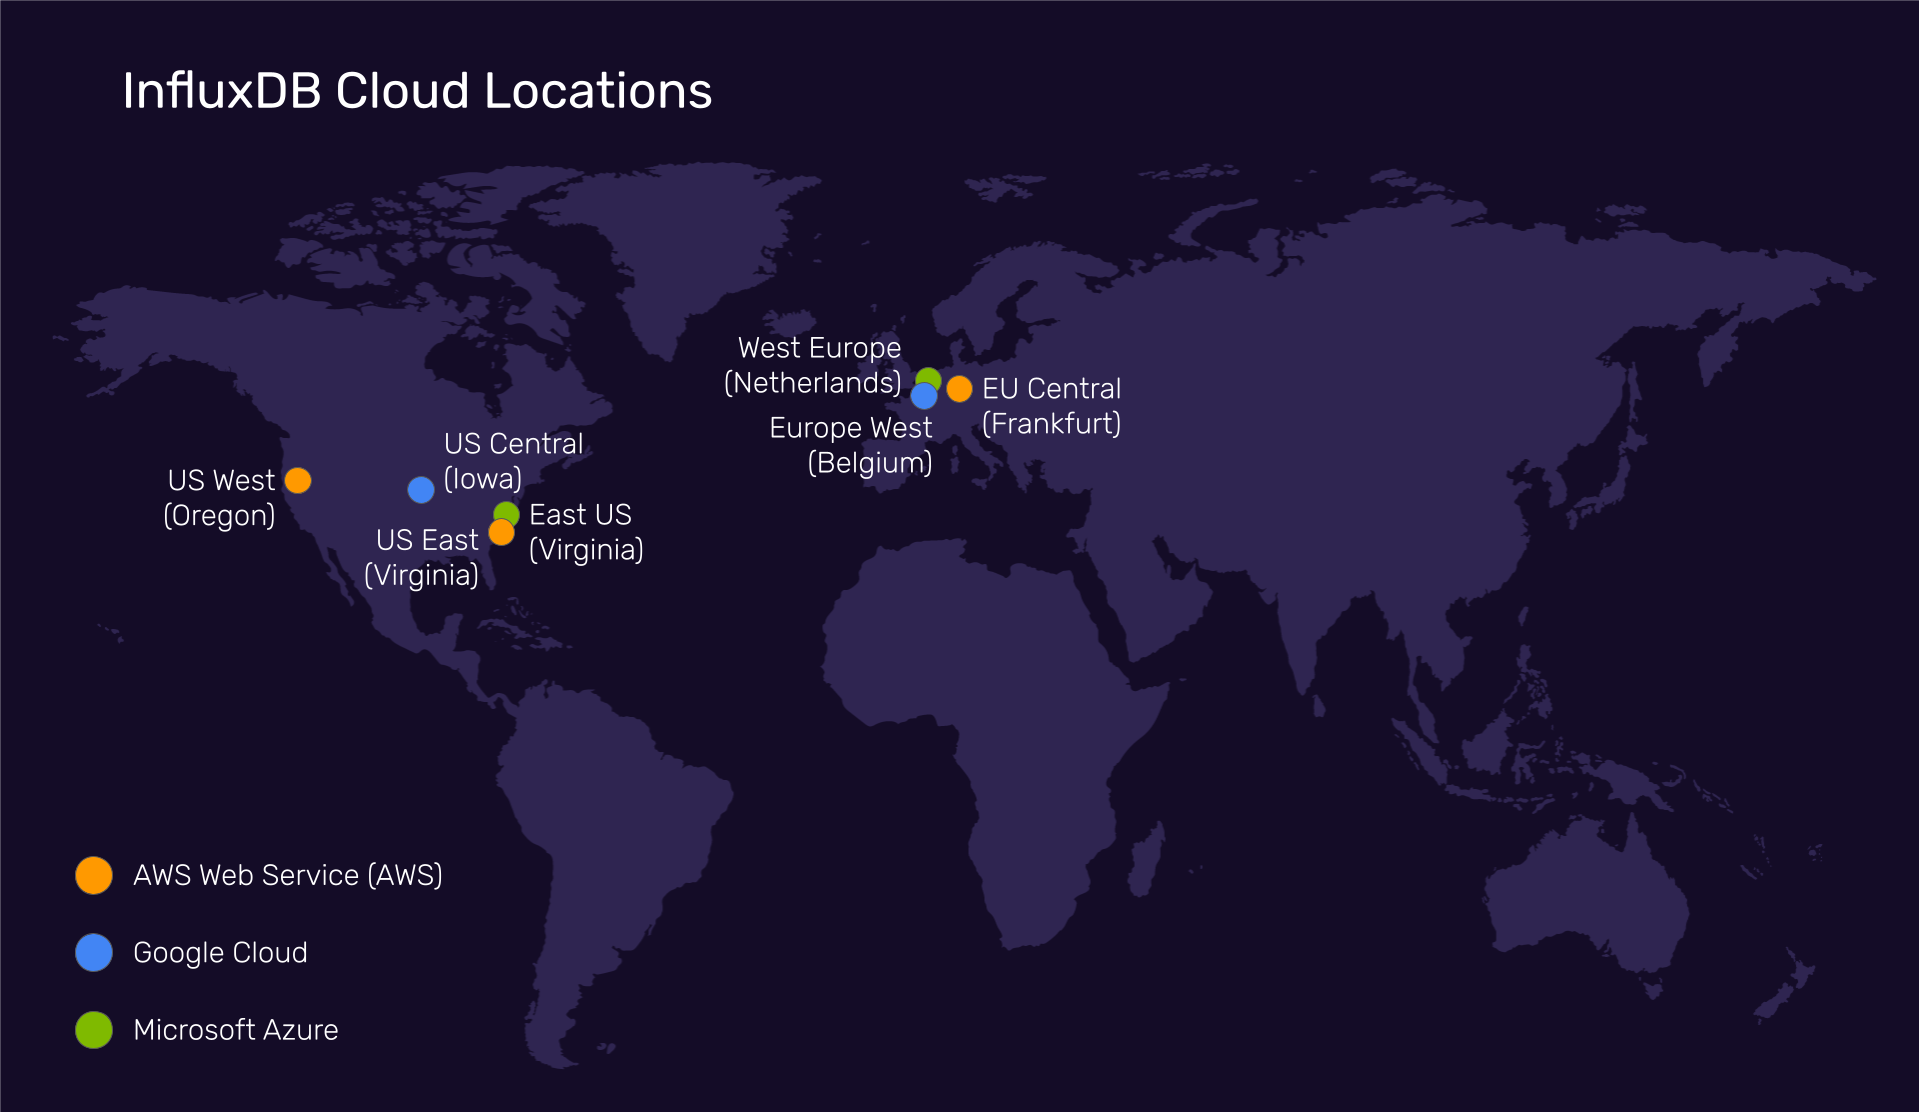 InfluxDB-Cloud-Locations-Map-2021